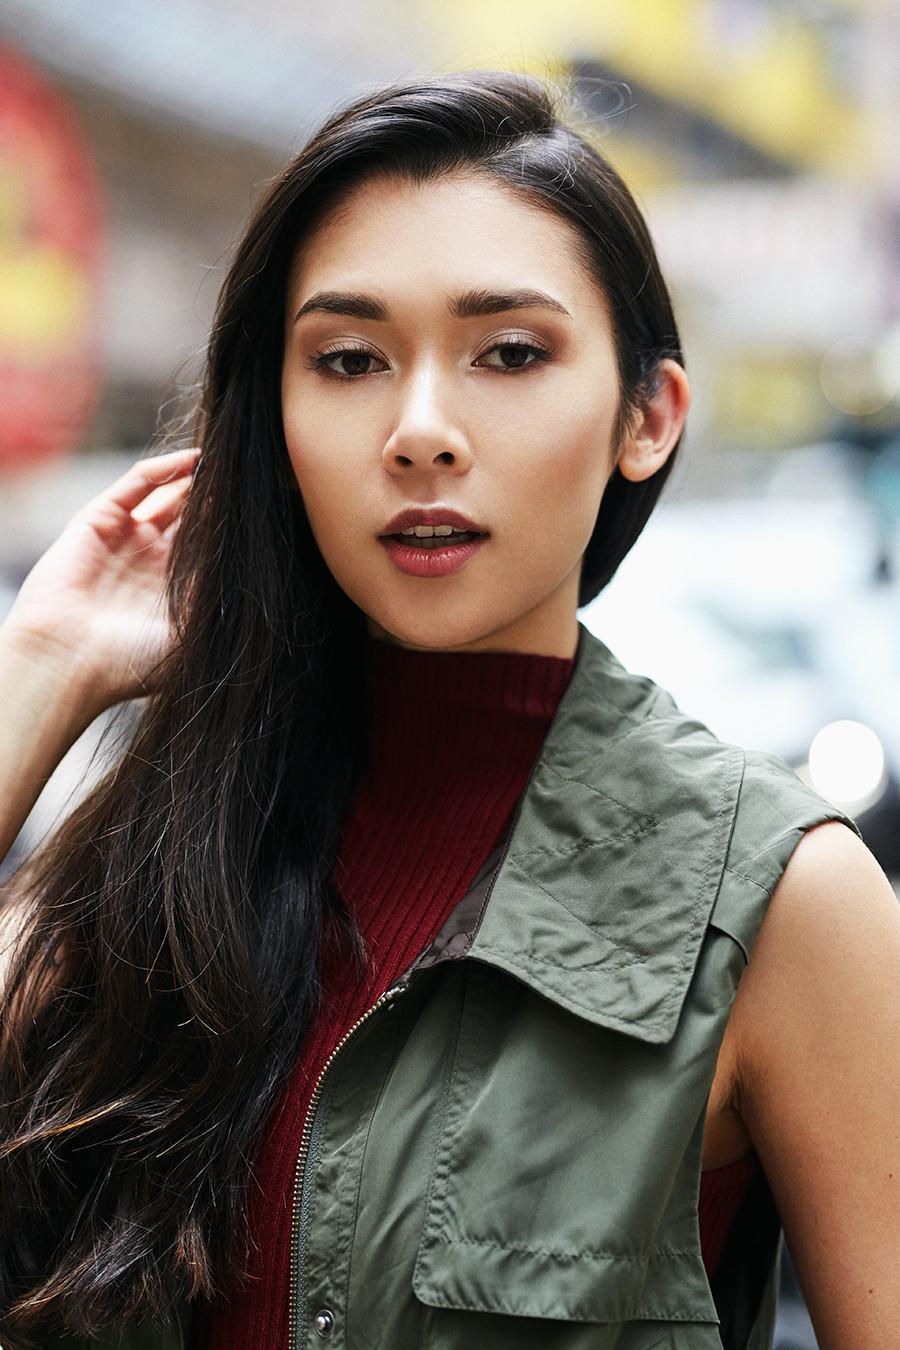 Celebrity Makeup Artists in Hong Kong